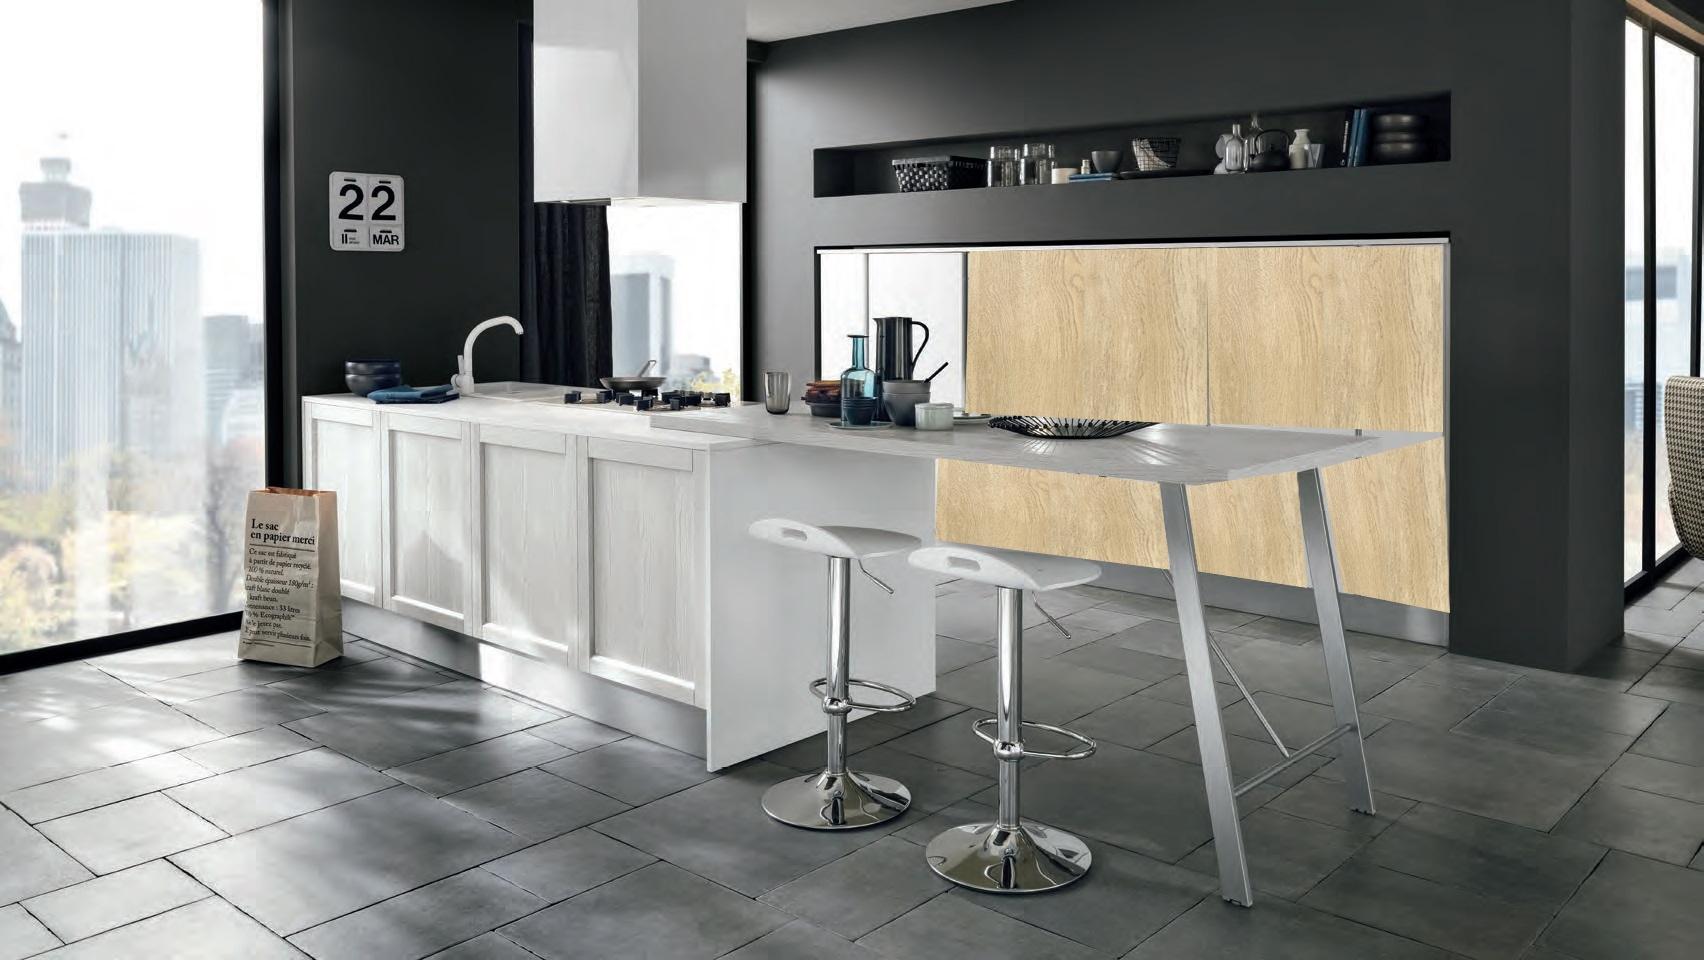 Cucina isola white in legno white dalila in offerta - Cucina in offerta ...